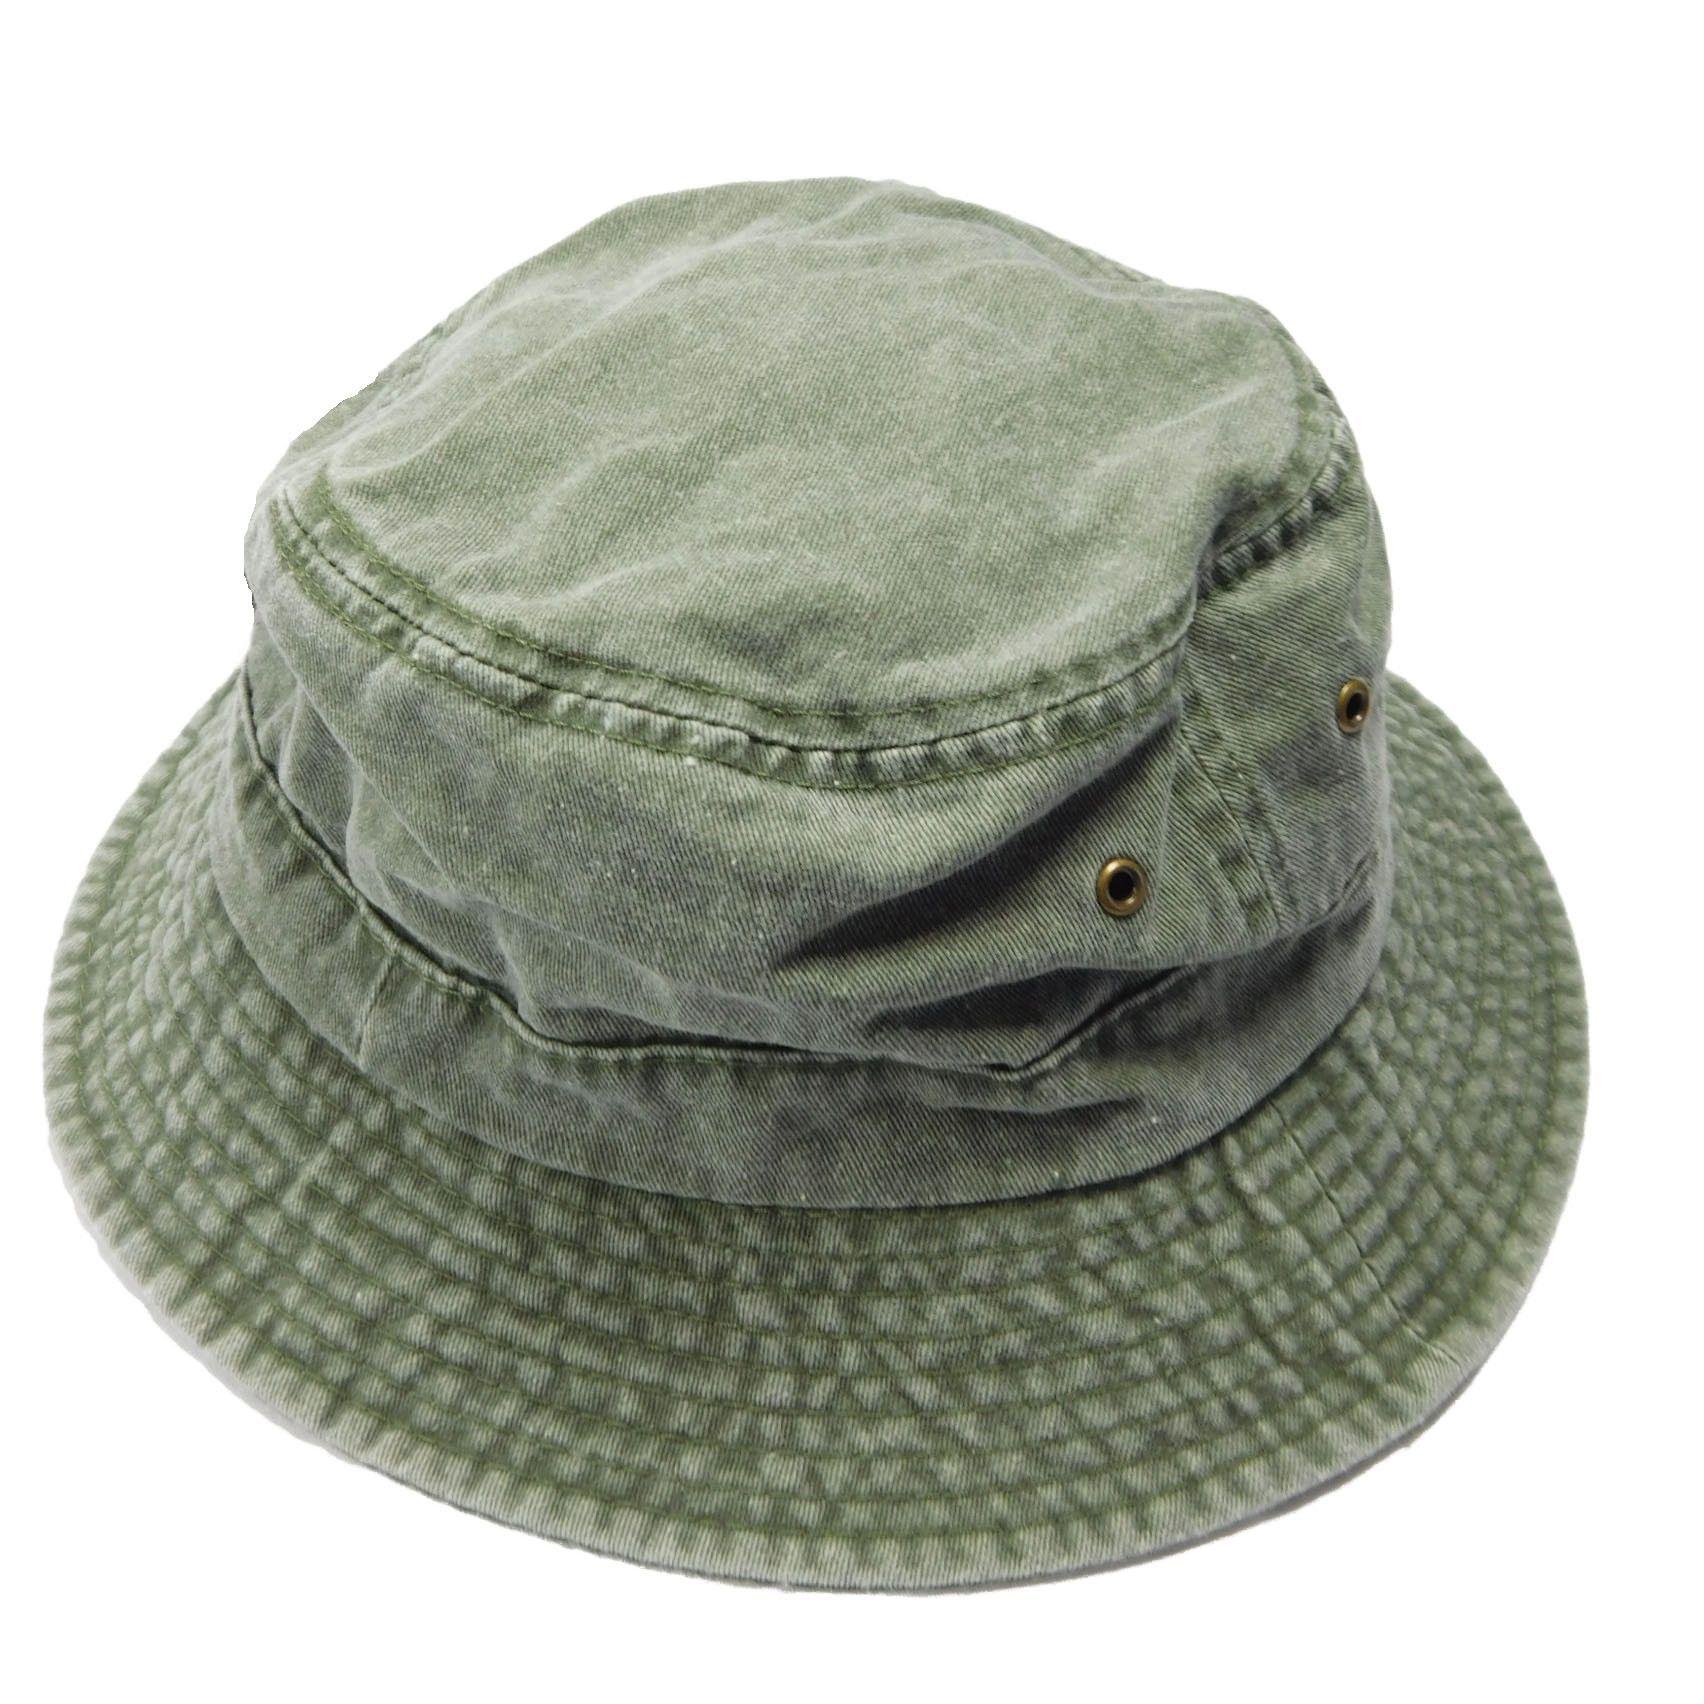 Dpc Dyed Twill Bucket Hat Fishing Umbrella Hats Bucket Hat